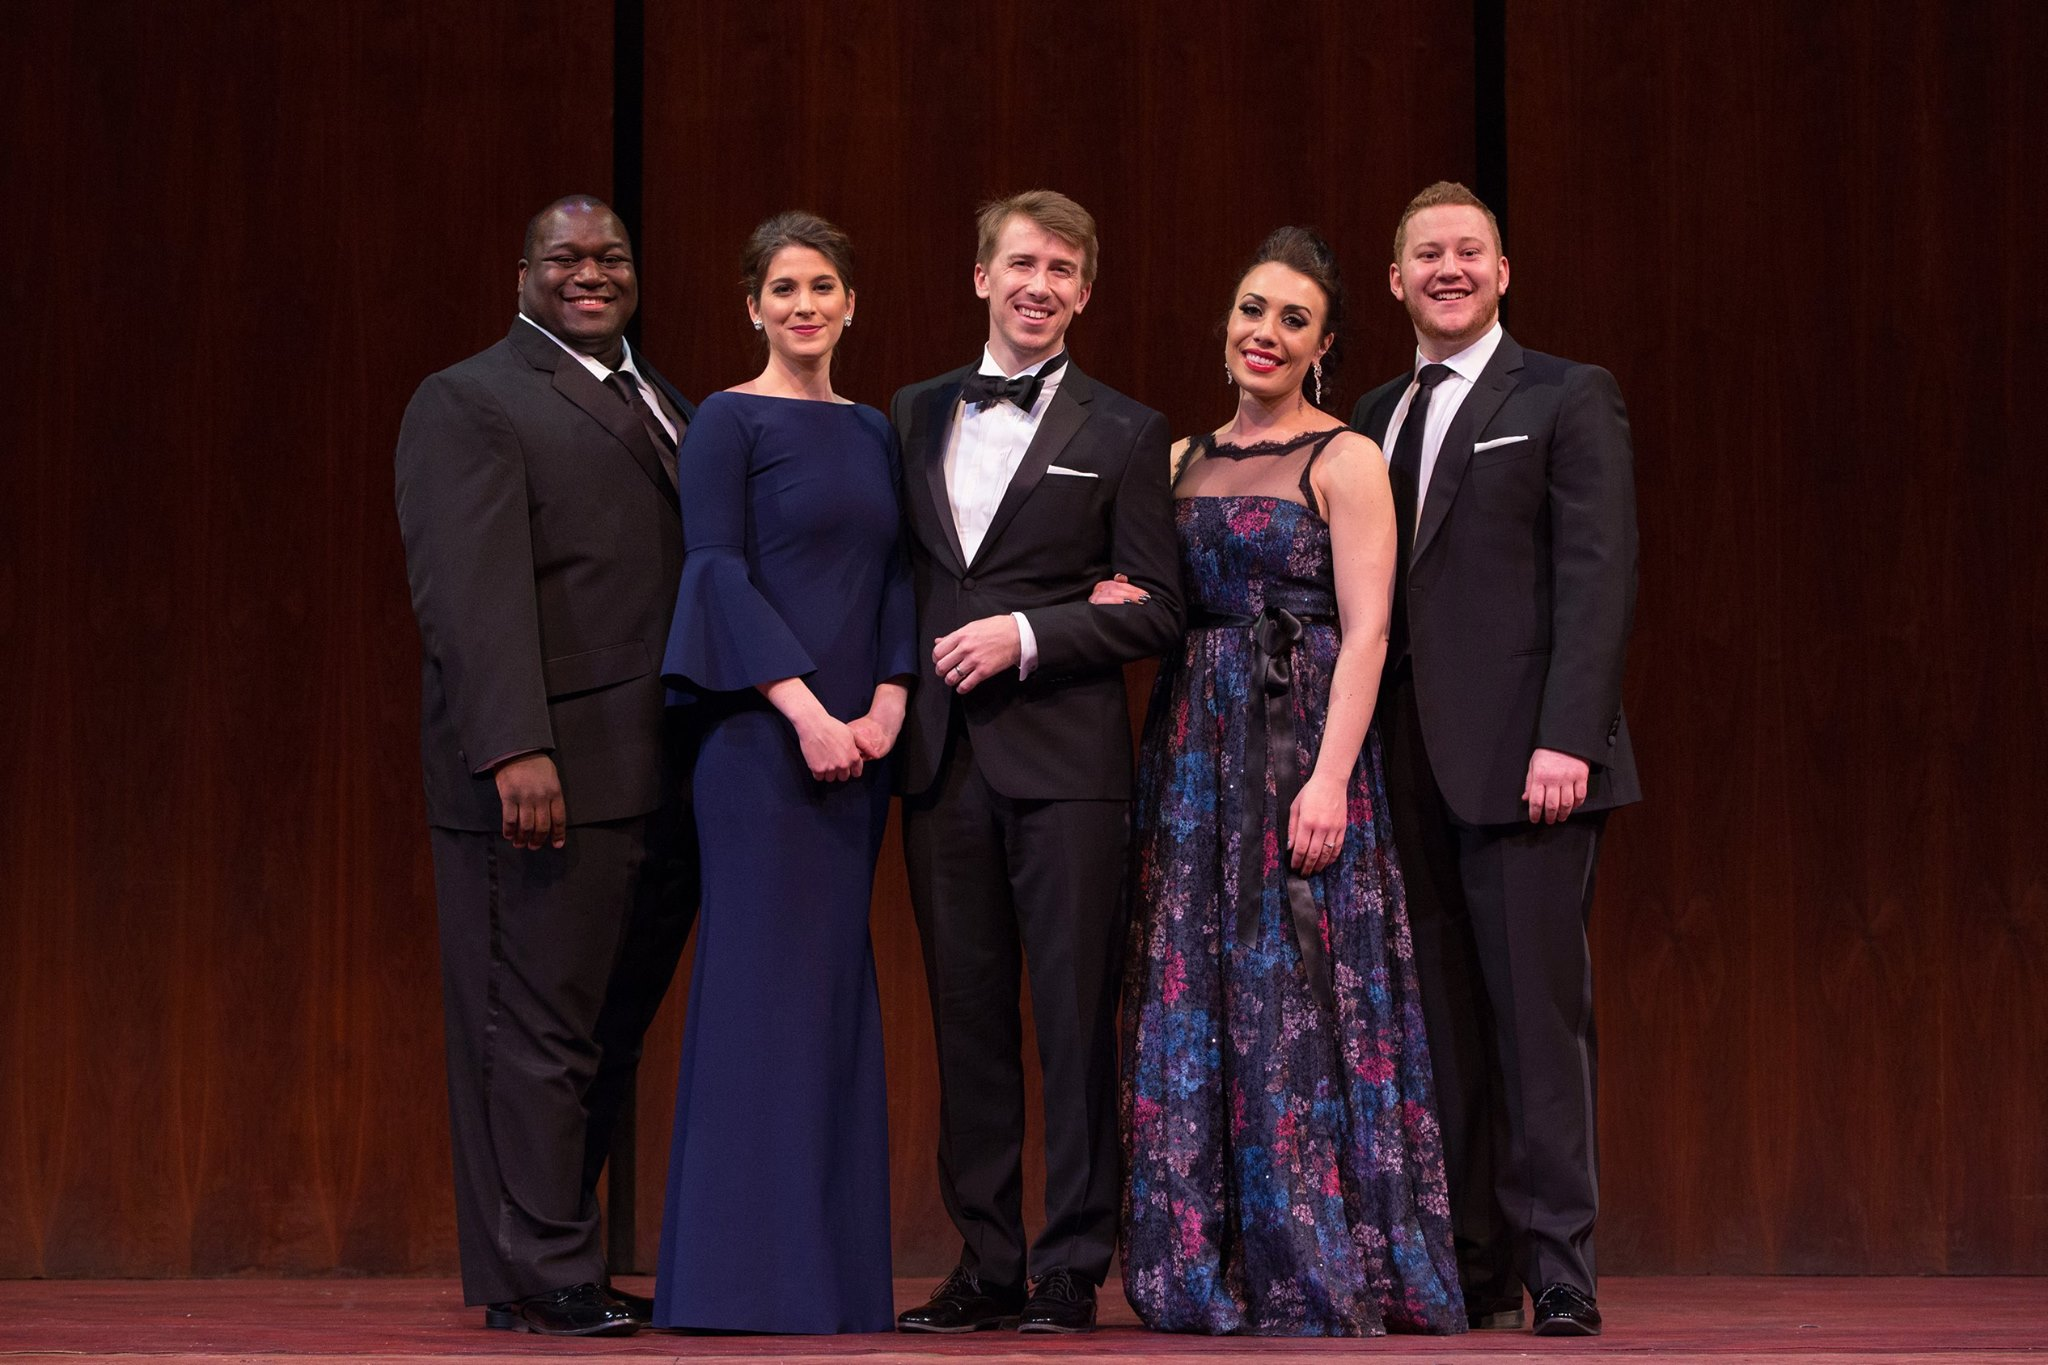 Winners Reginald Smith Jr., Virginie Verrez, Joseph Dennis, Marina Costa - Jackson and Nicholas Brownlee - Courtesy ofMarty Sohl/Met Opera